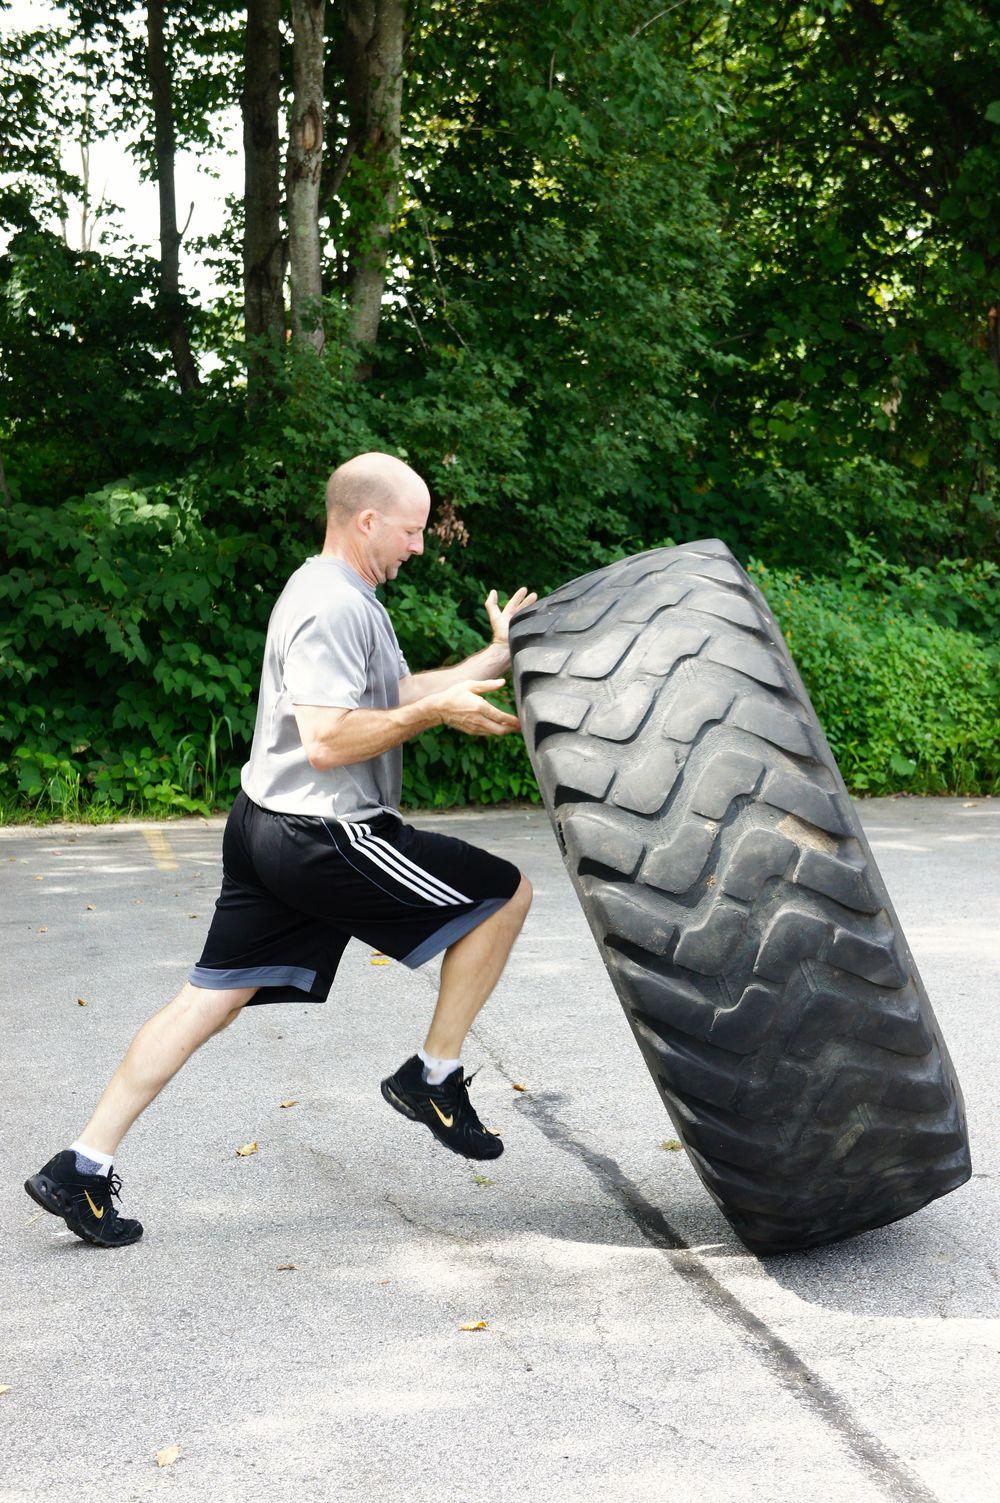 Mark. Tire flips